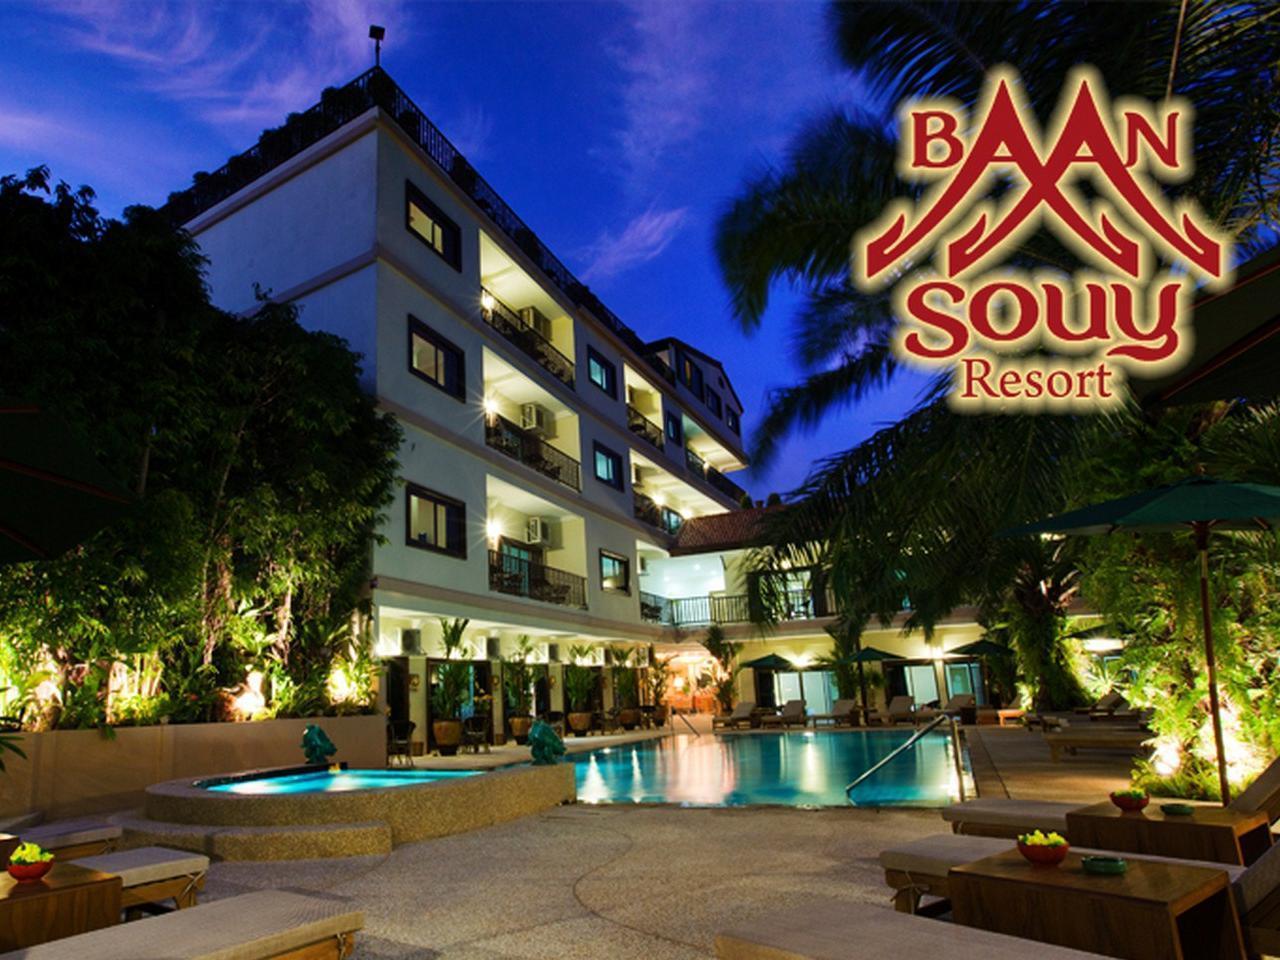 Baan Souy Resort บ้านสวย รีสอร์ท